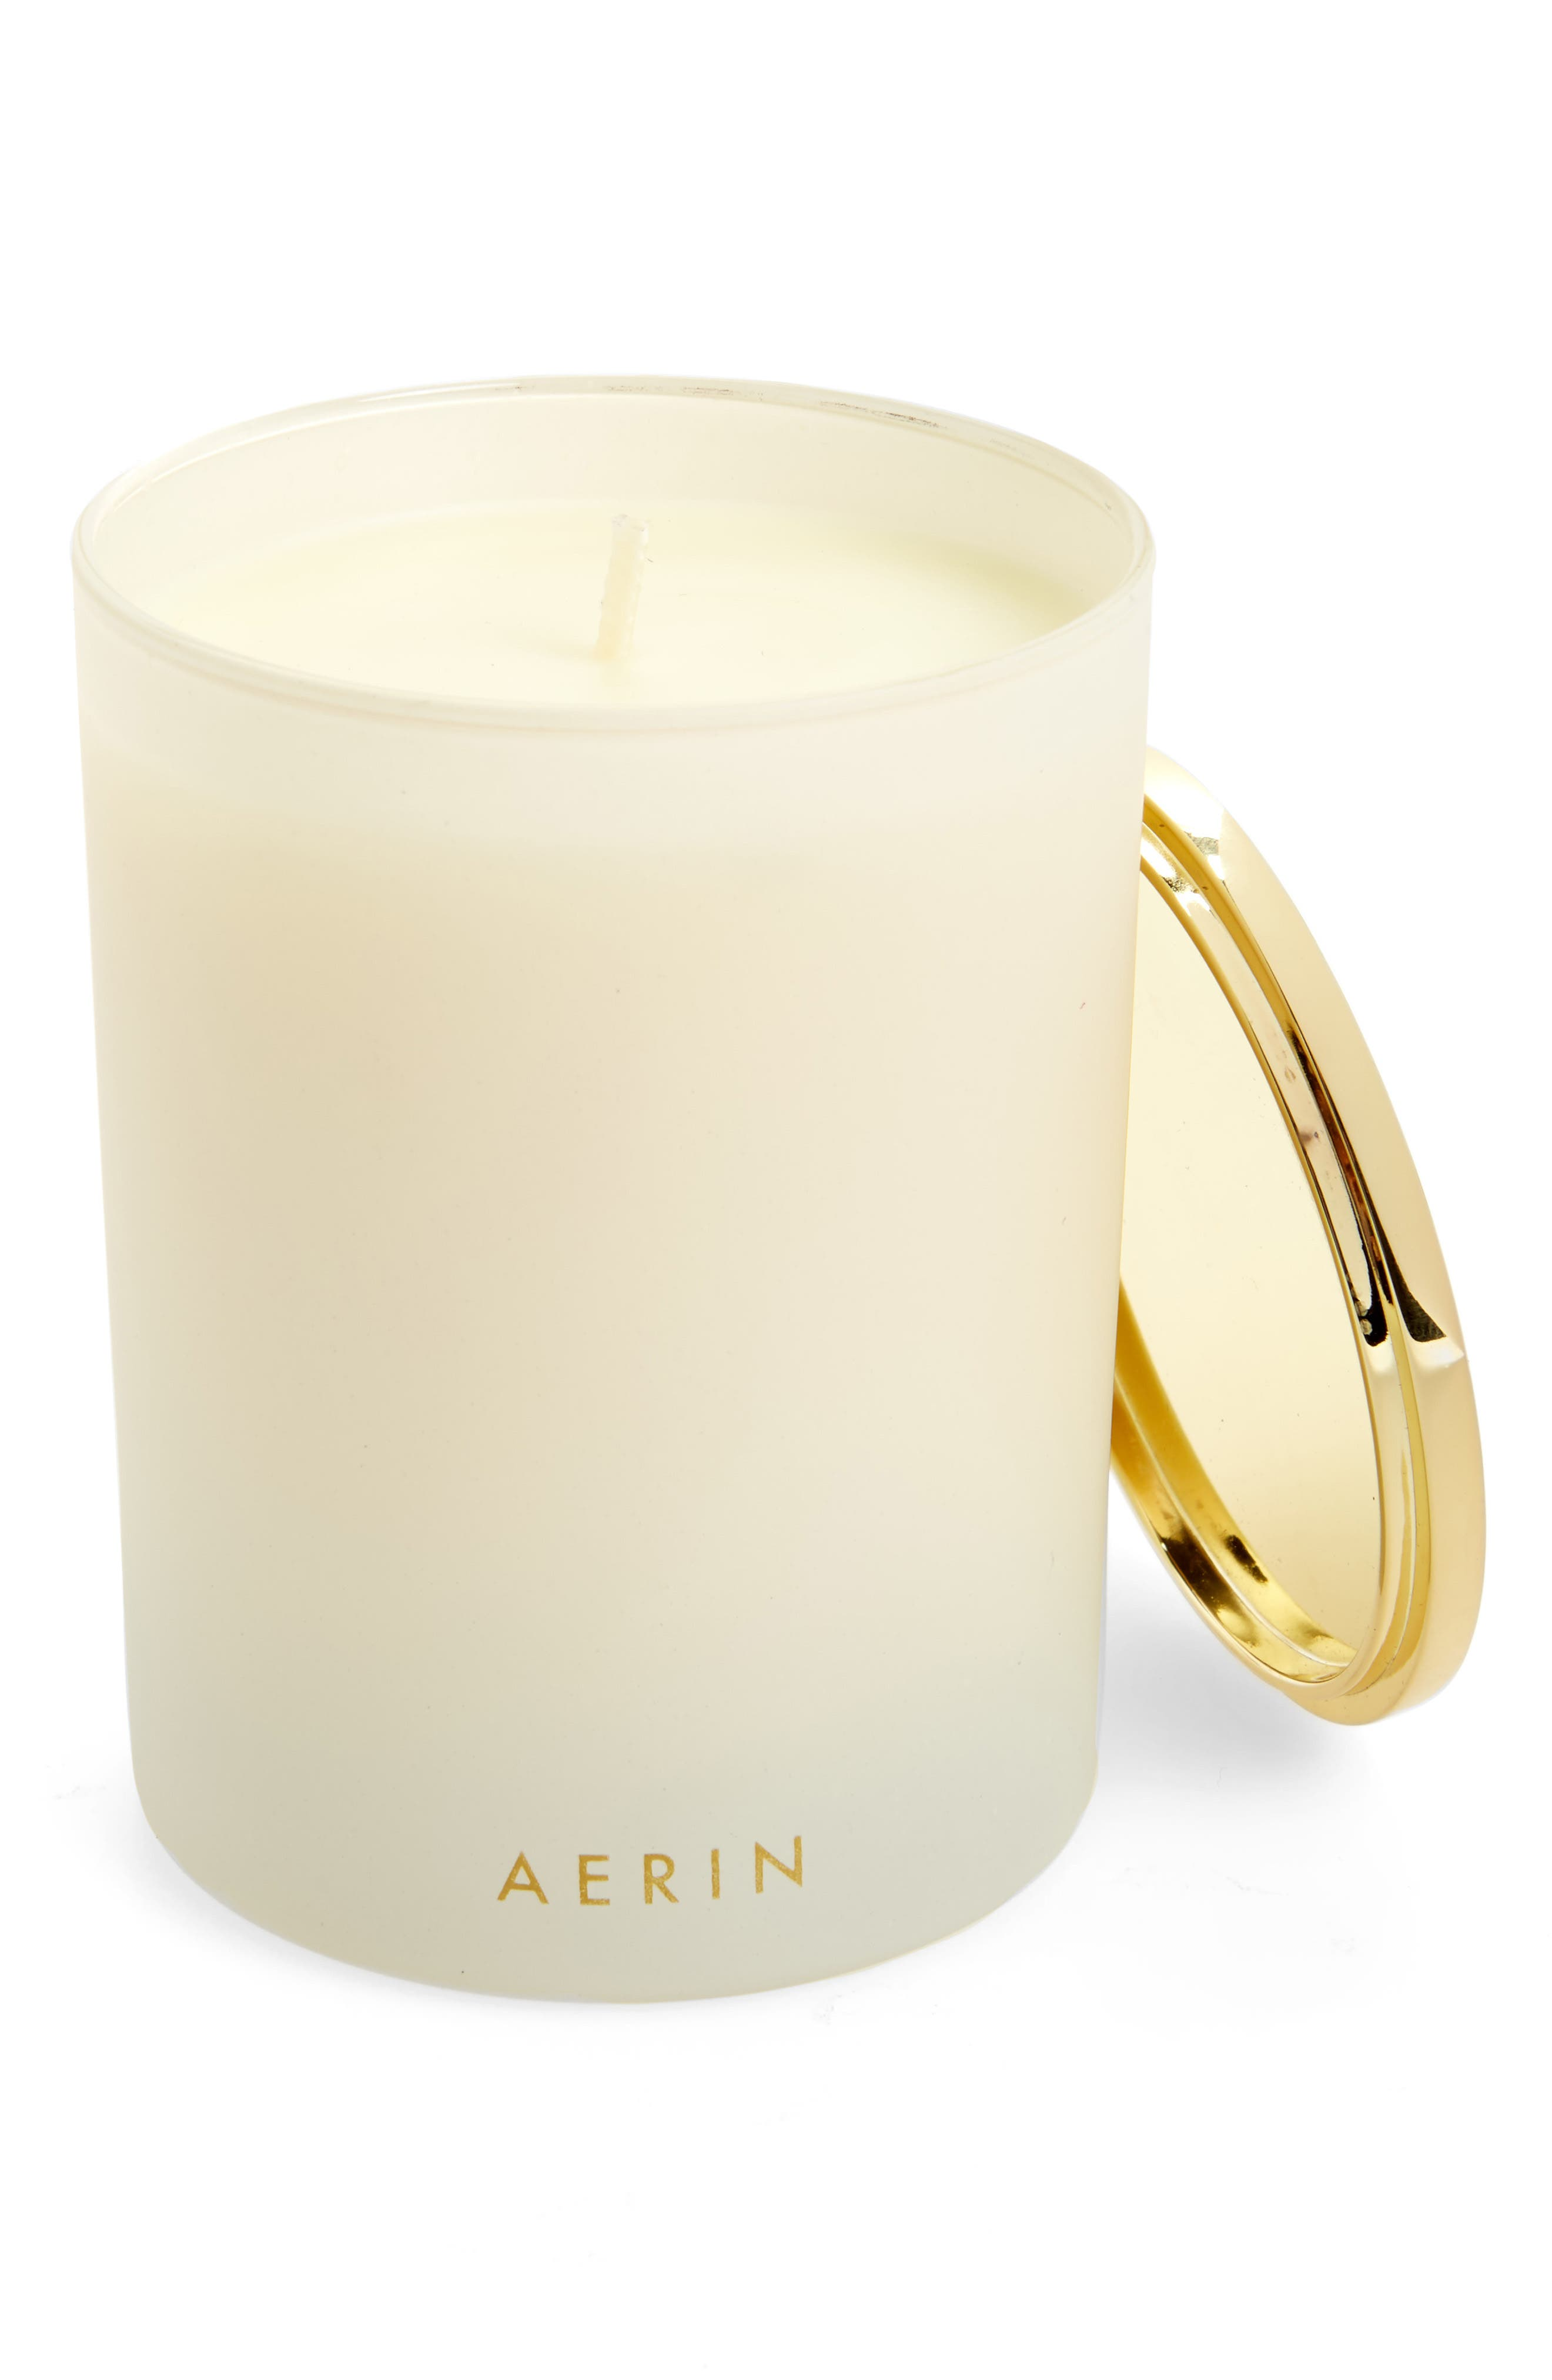 AERIN Orange Blossom Candle